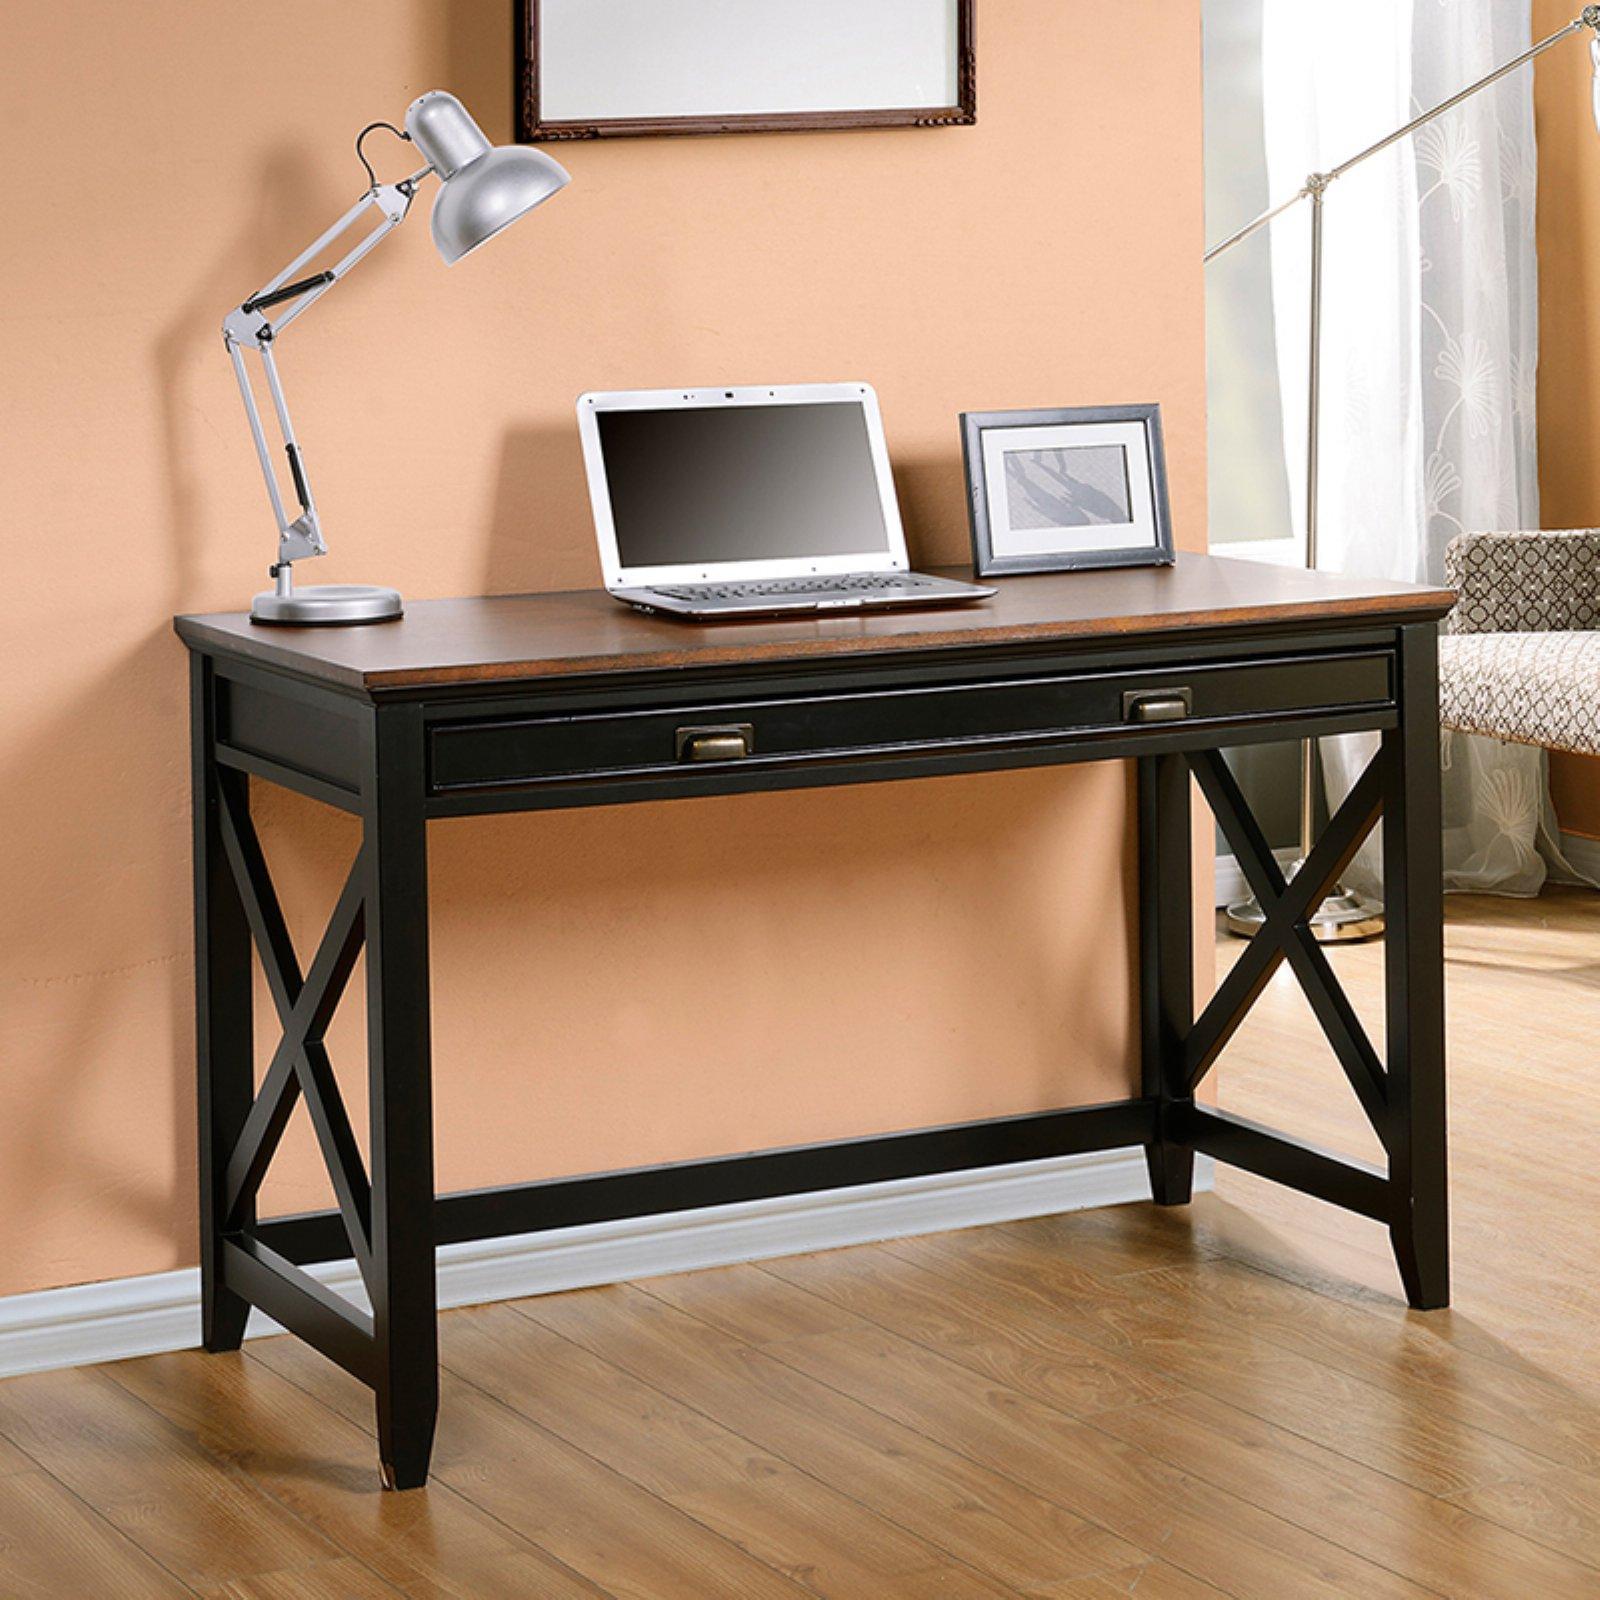 Homestar Writing Desk with Drawer, Black/Wood Finish